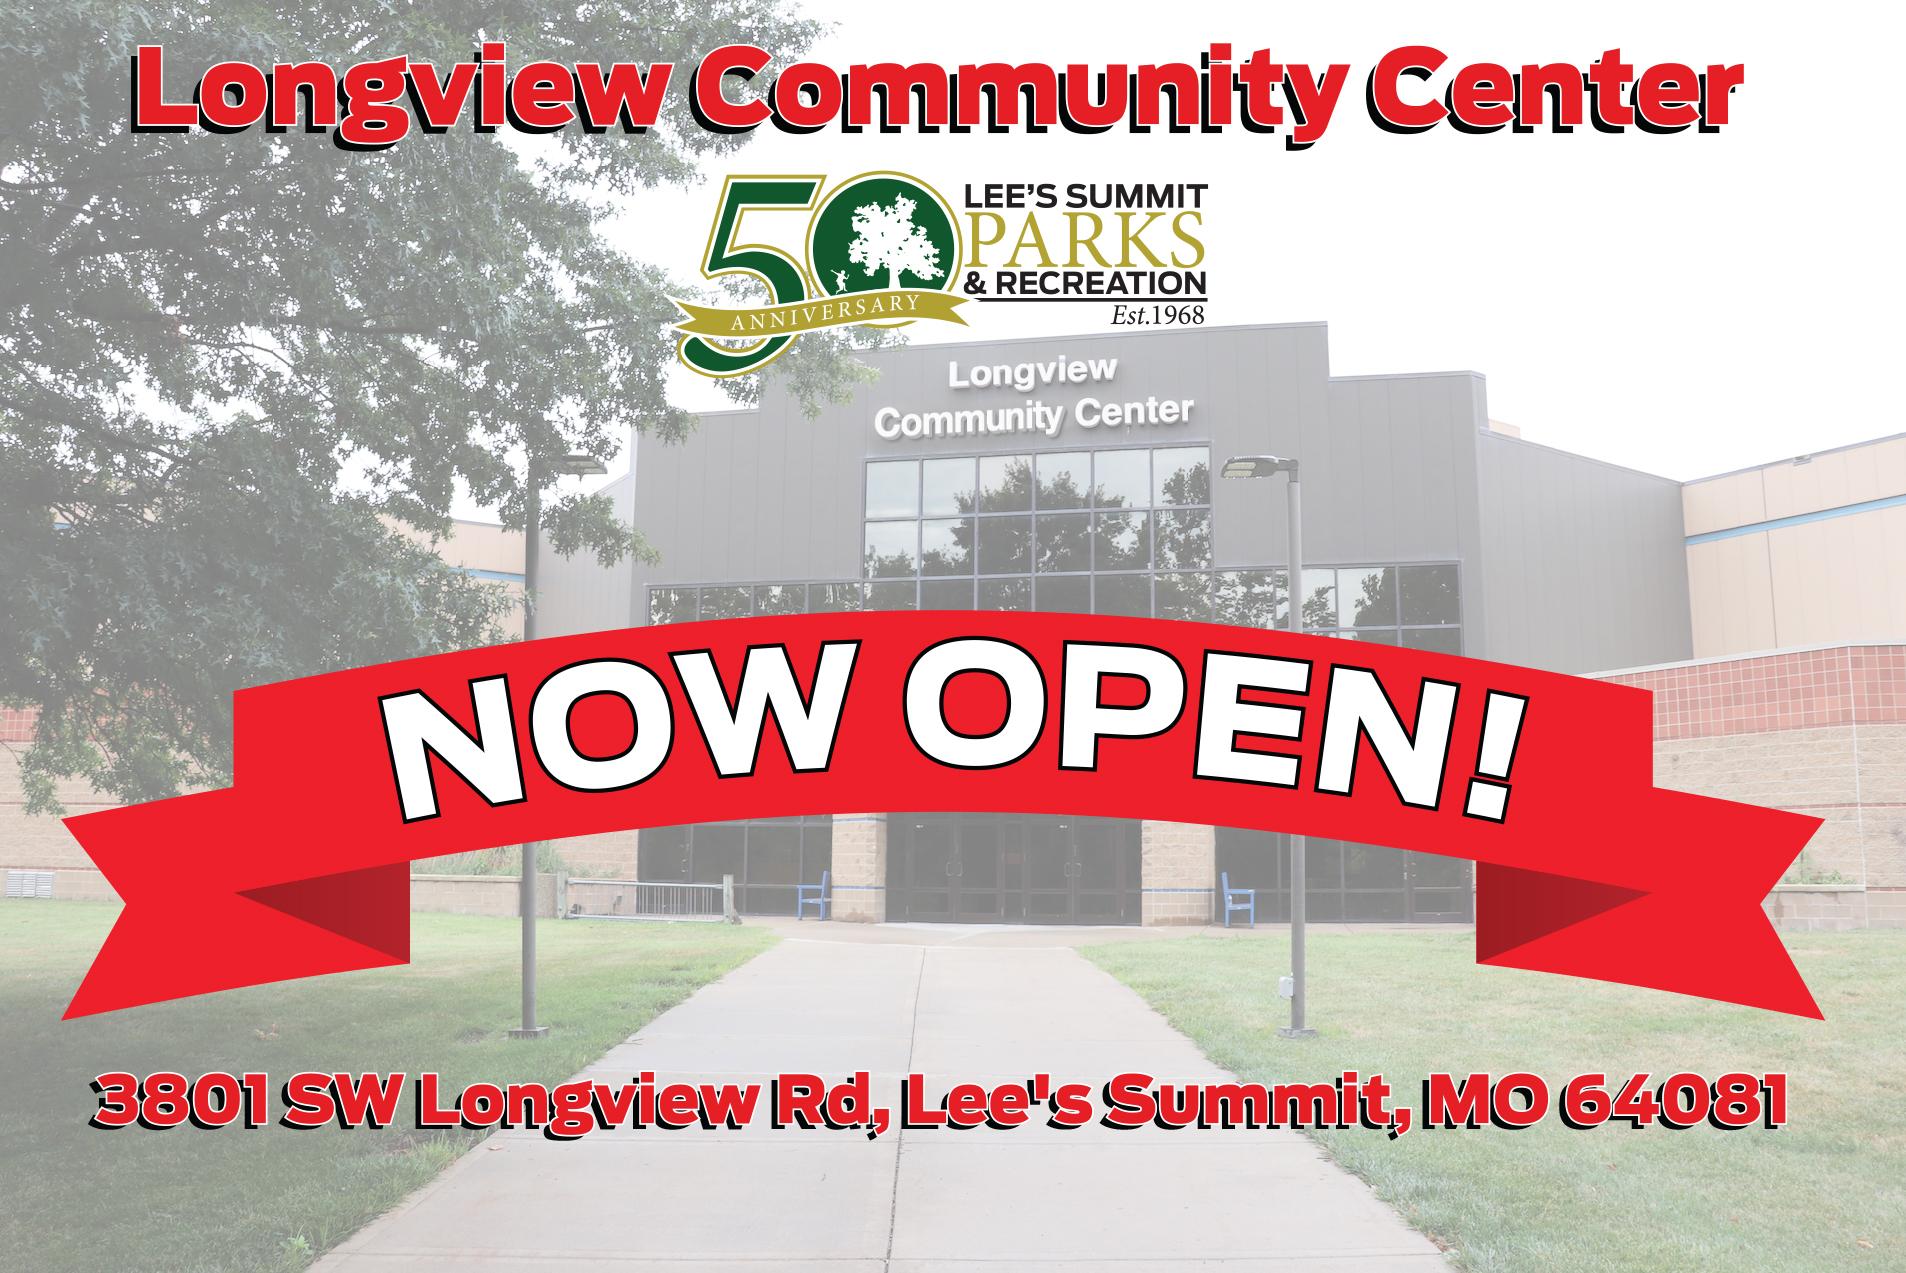 Longview Community Center Opening December 17